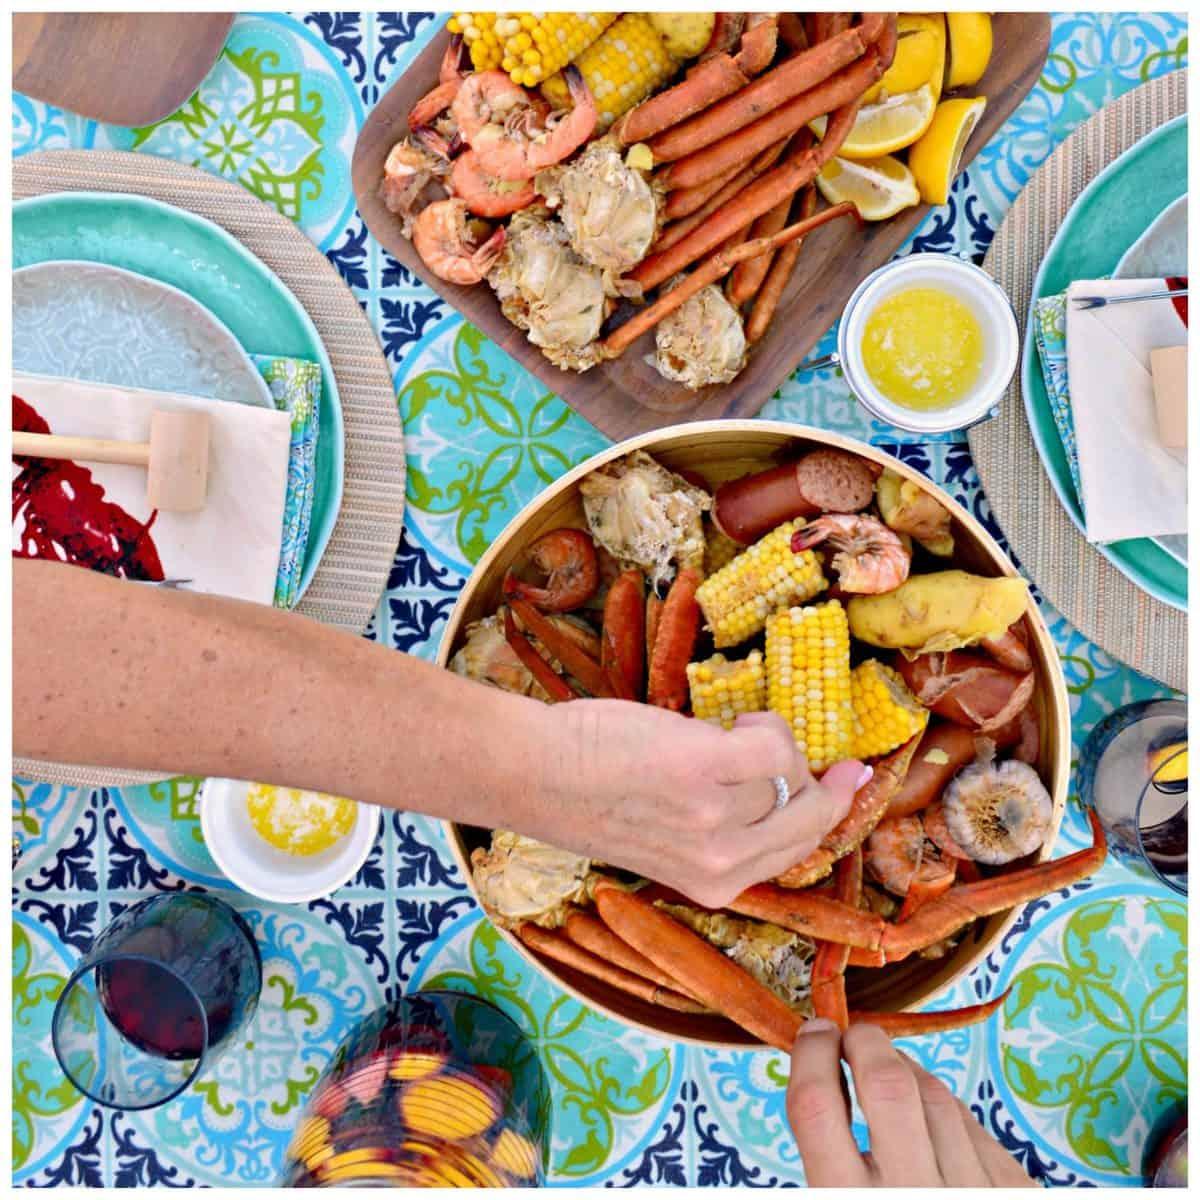 Crab Leg & Shrimp Boil